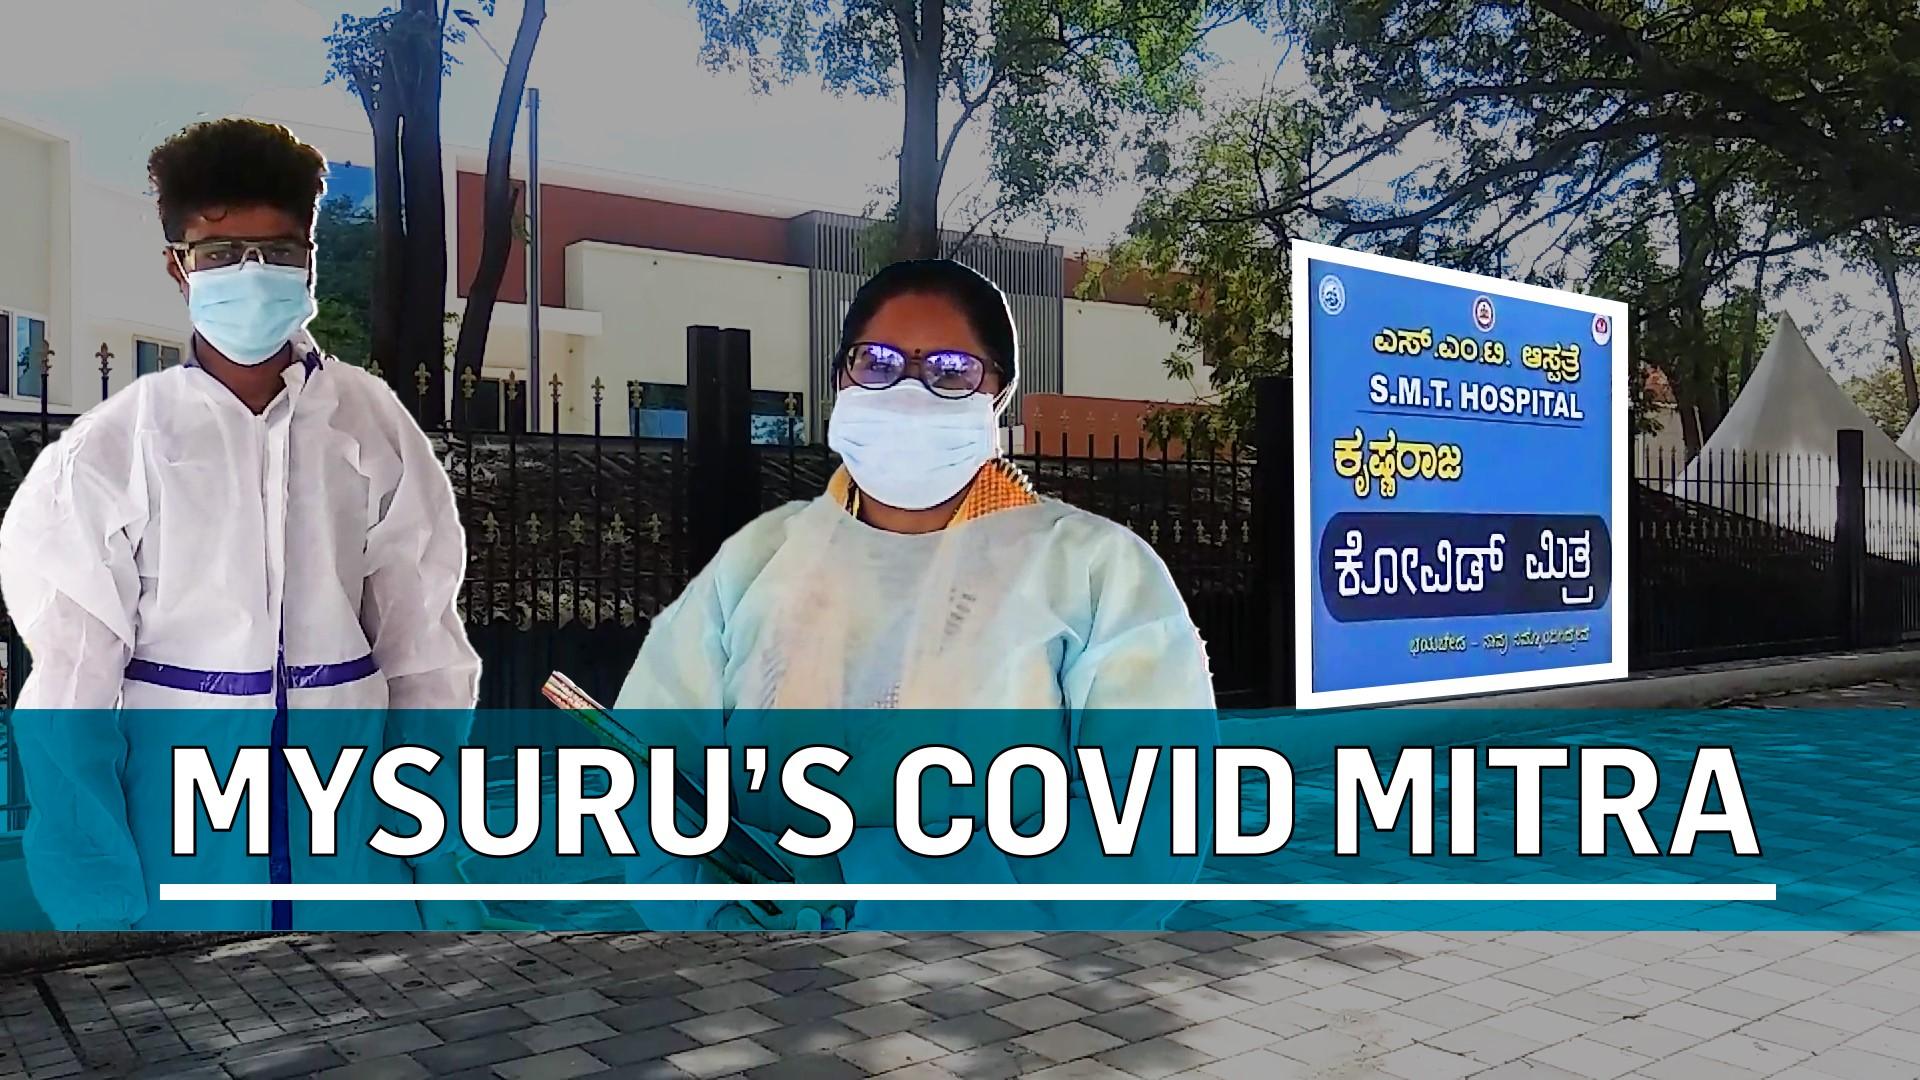 How Mysuru's Covid Mitra is tackling Covid-19